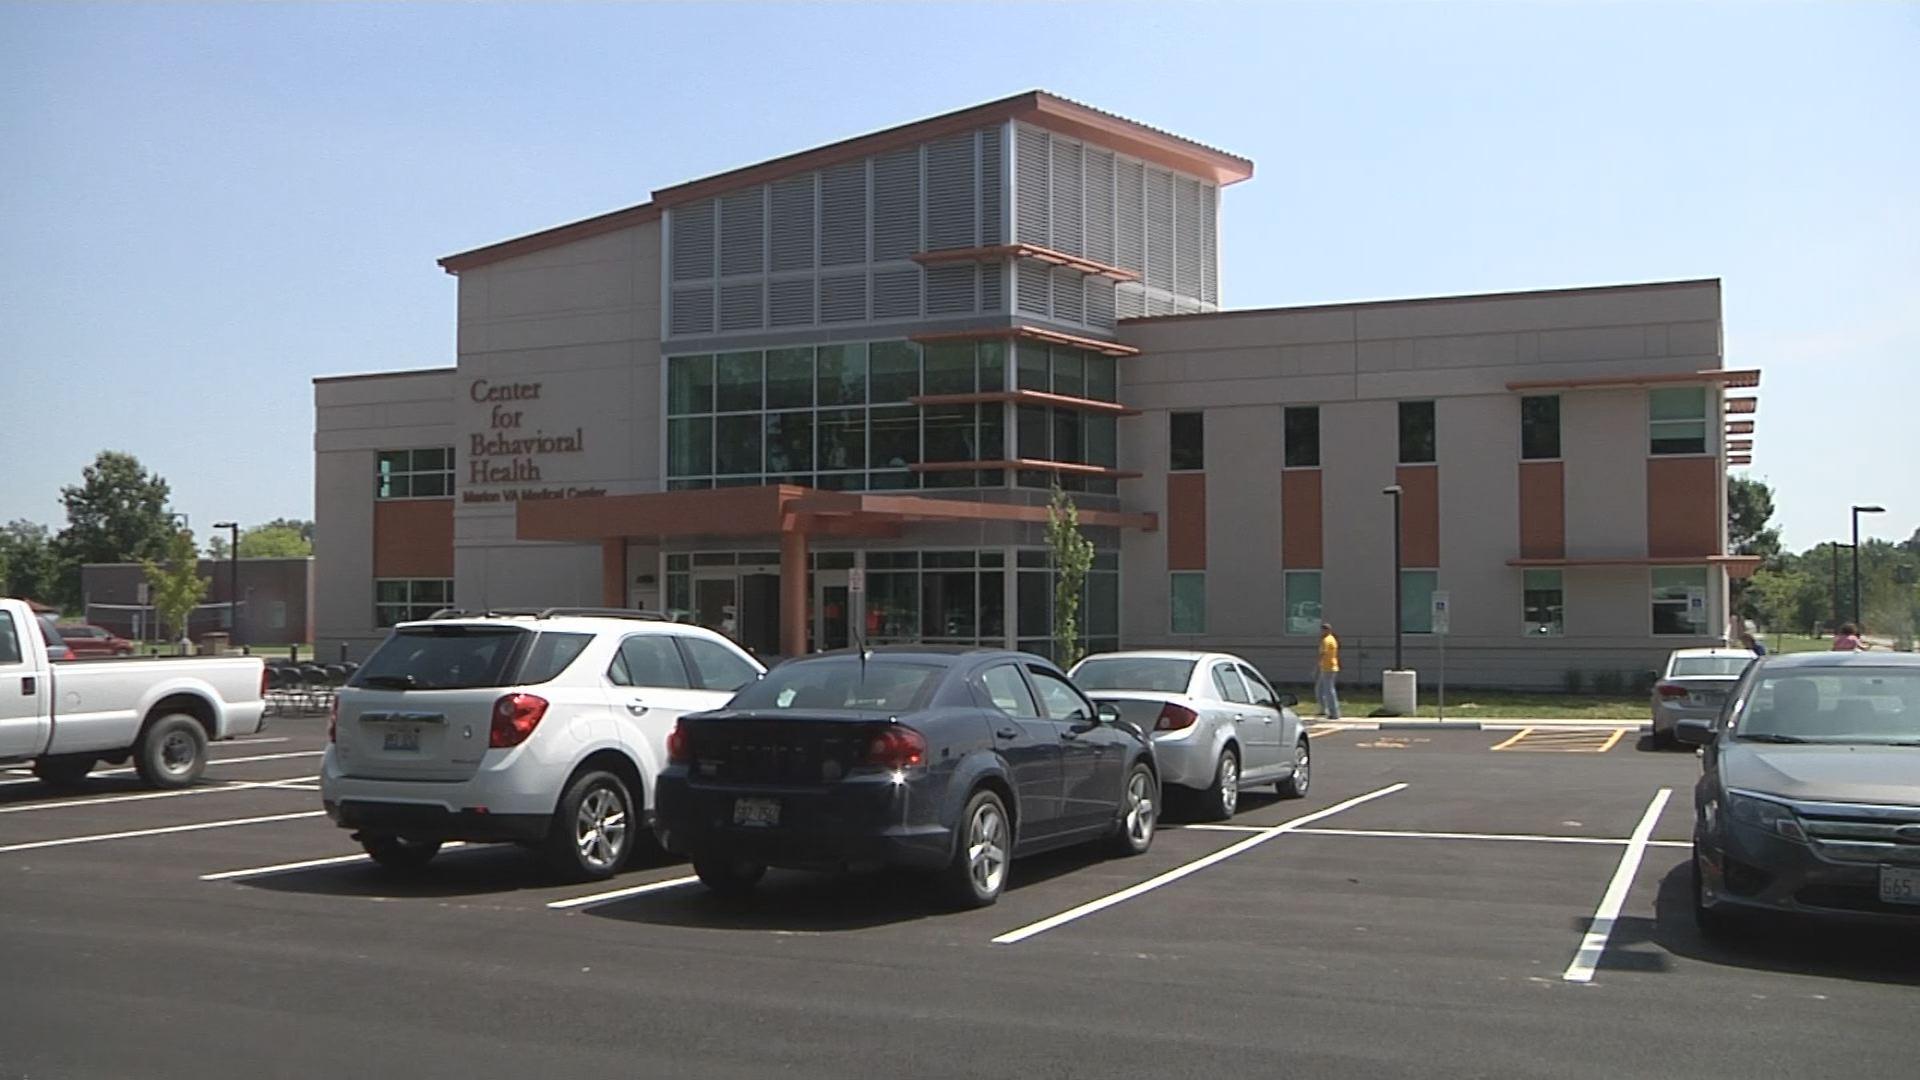 Marion VA Behavioral Health Center